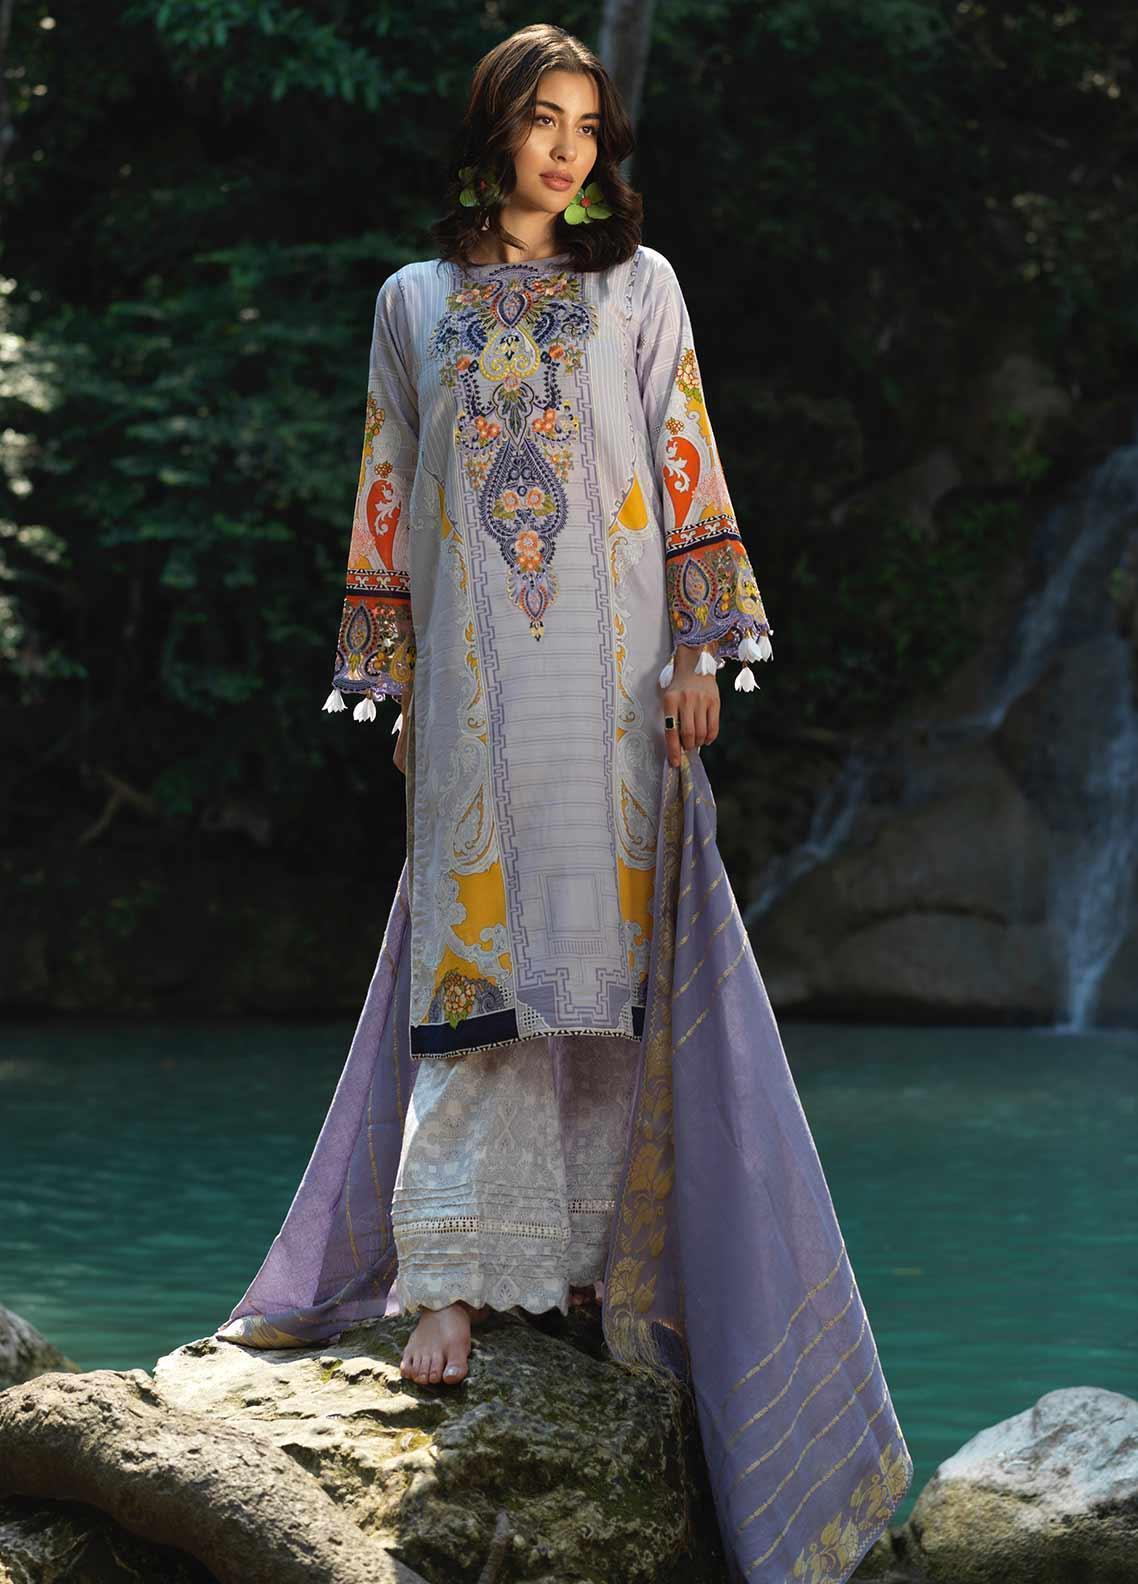 Ittehad Textiles Embroidered Lawn Unstitched 3 Piece Suit ITD20DG VOILET CLAIR - Summer Collection